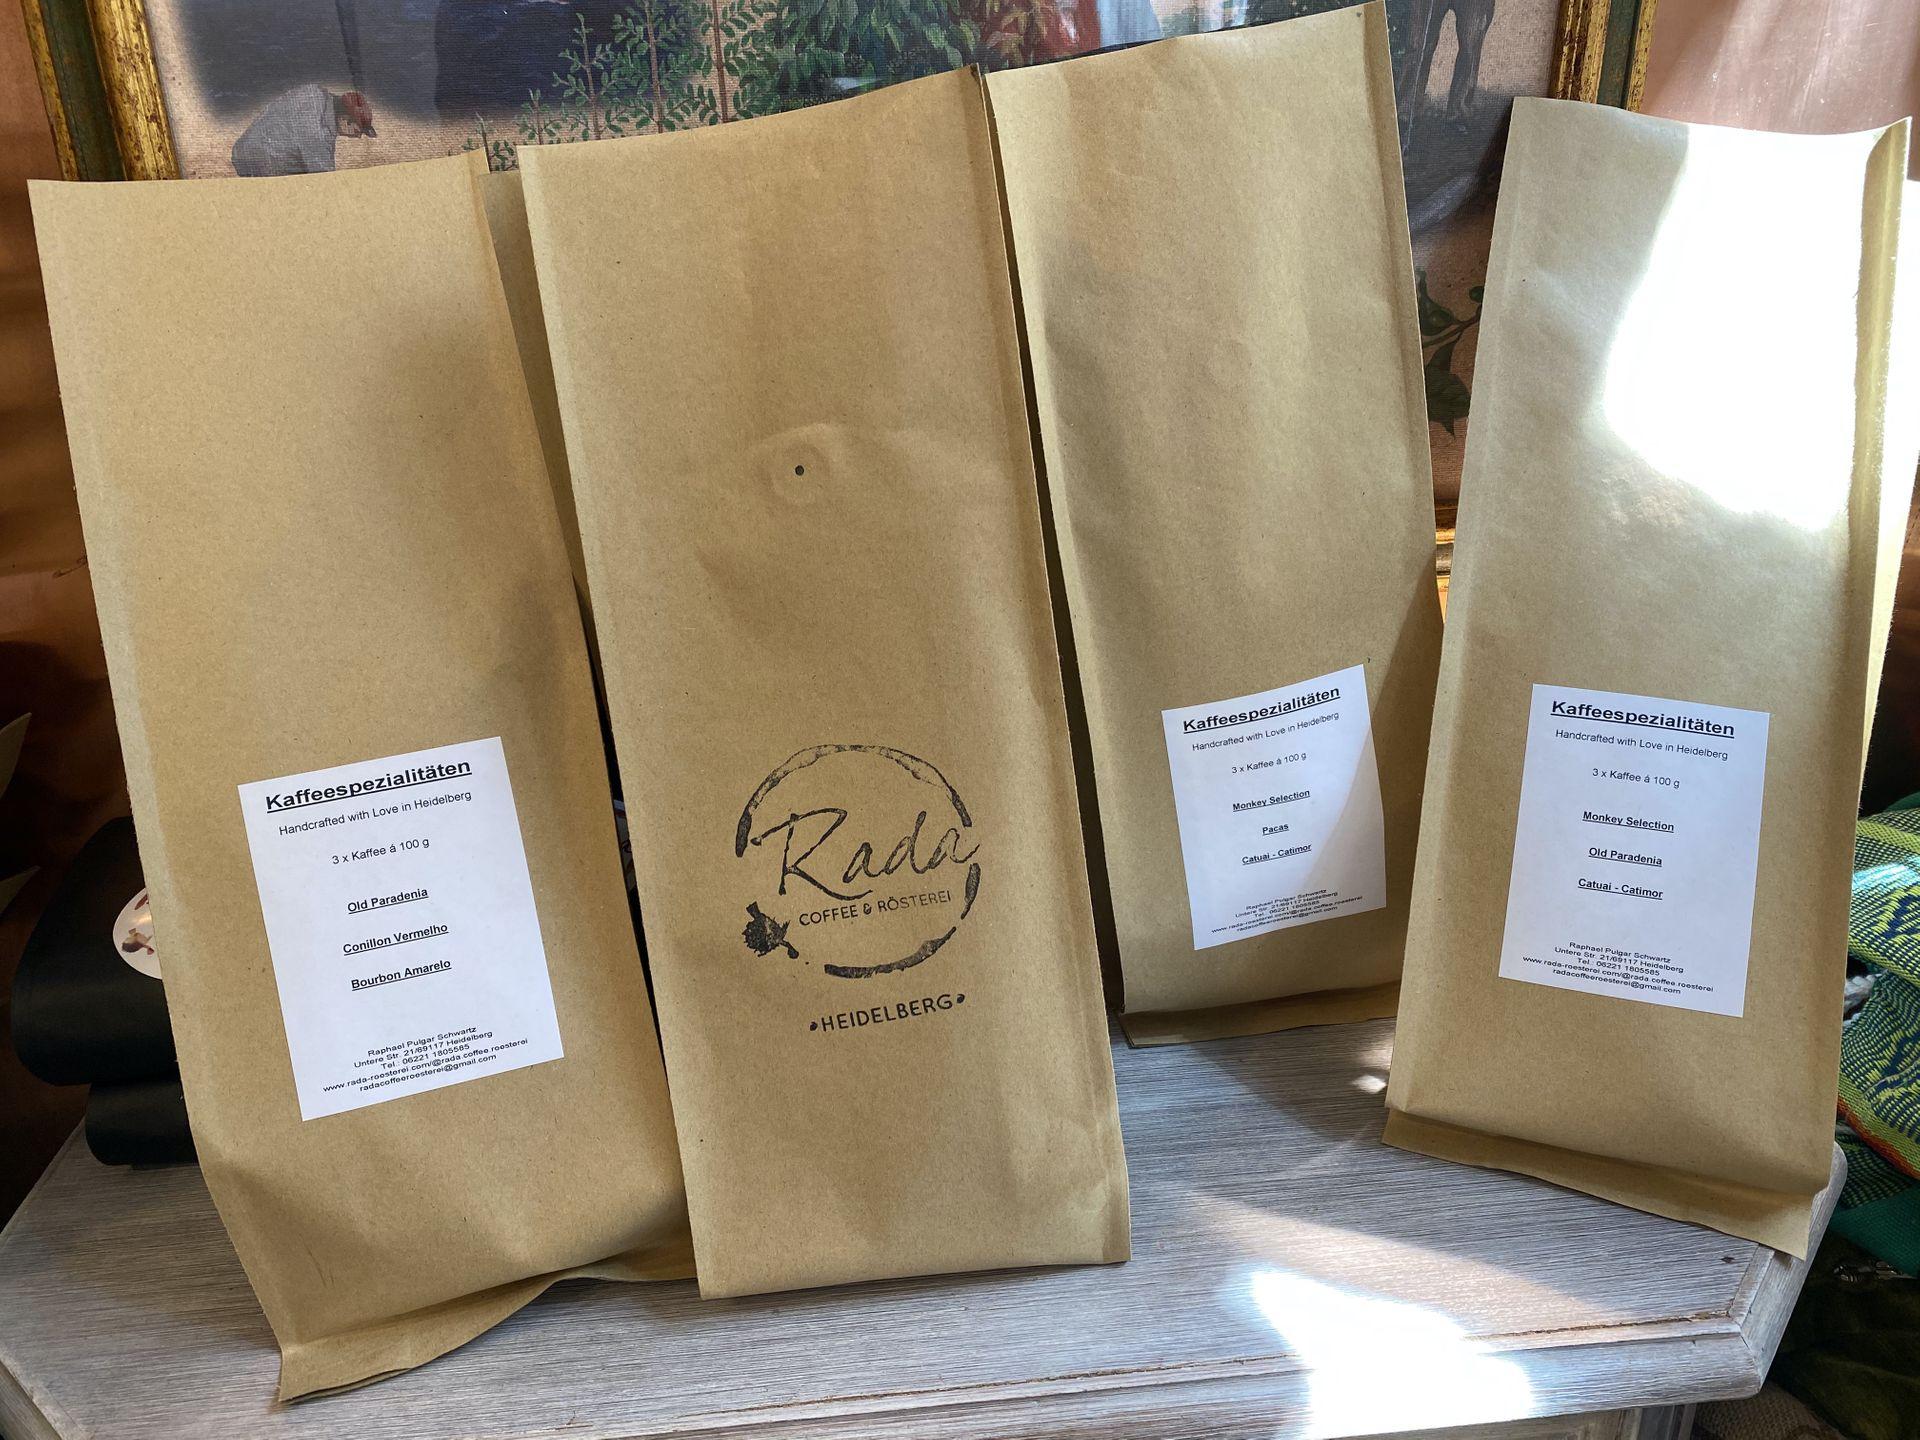 Rada Shop - Radashop | RADA Coffee & Rösterei